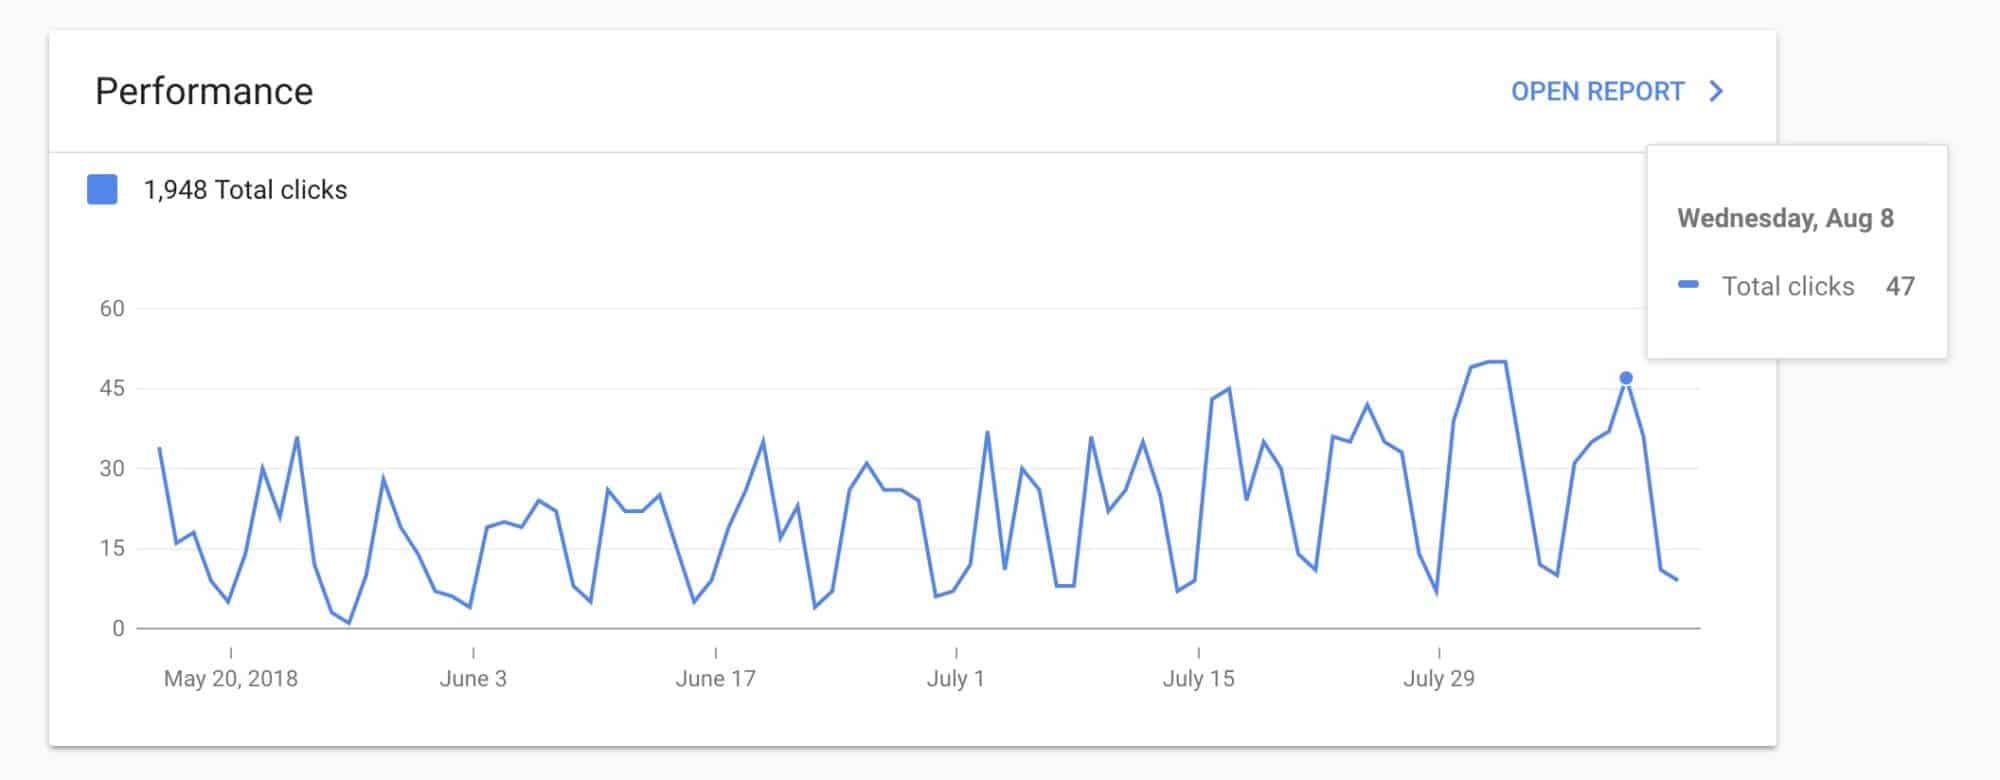 Small business - Google algorithm update volatility